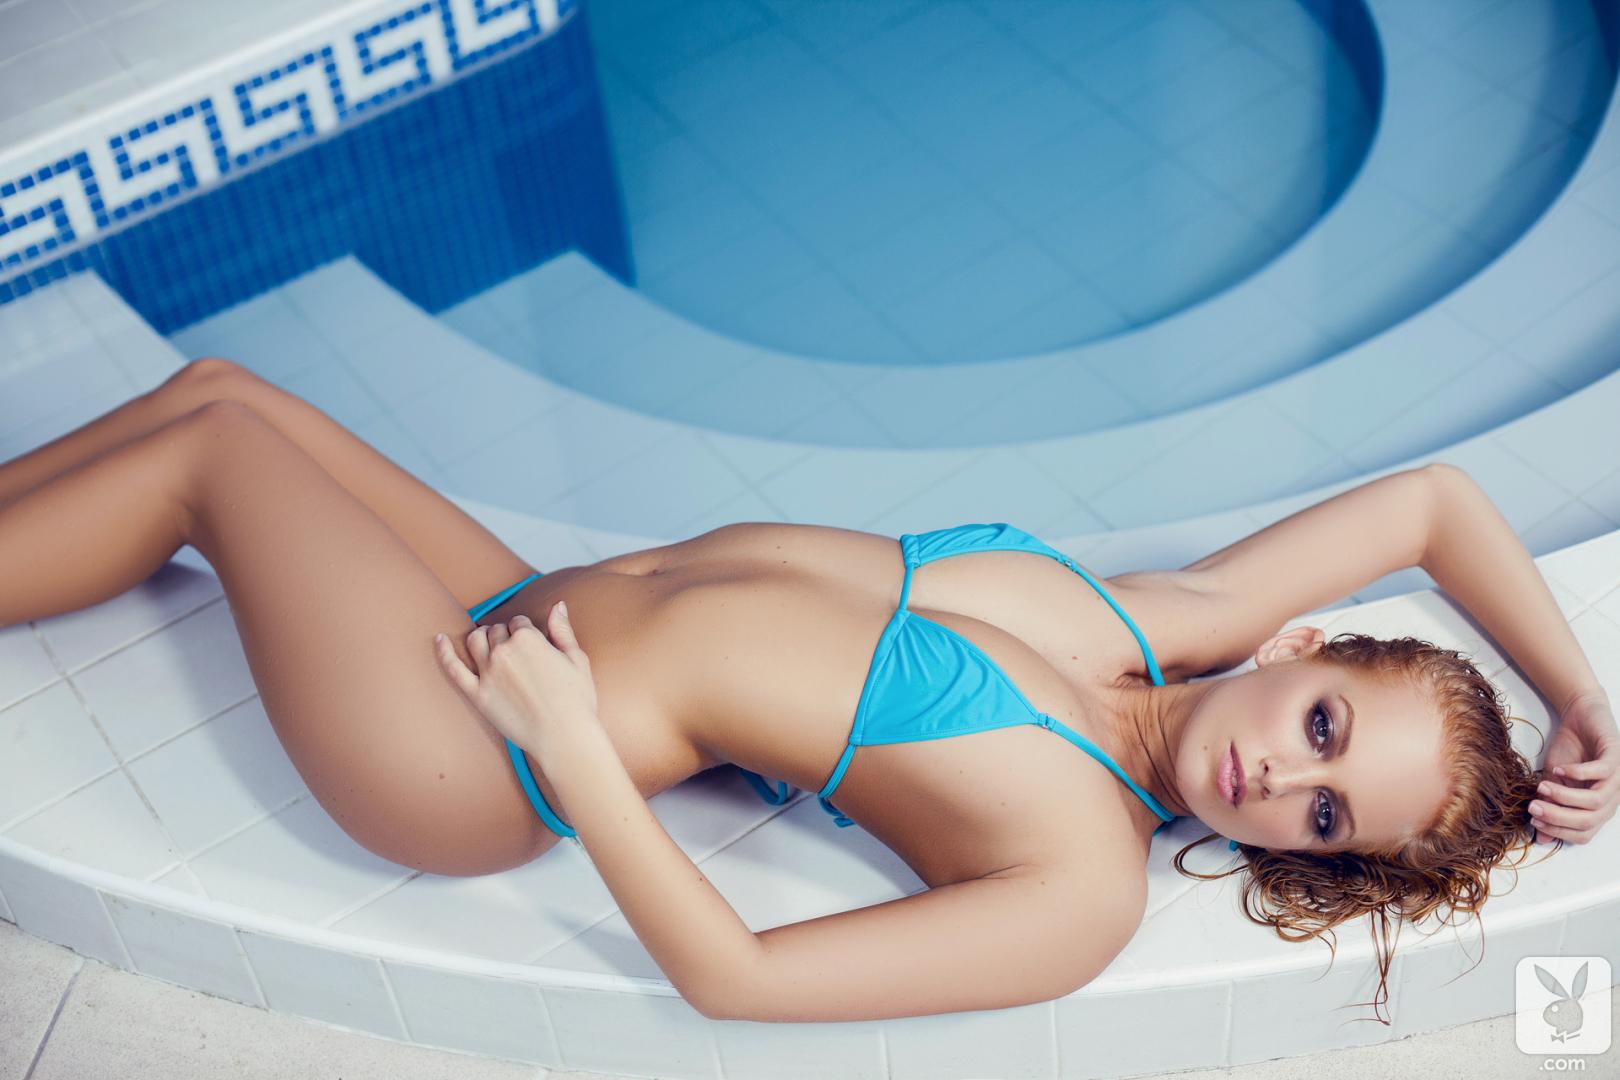 Playboy Cybergirl - Andrea Sullivan Nude Photos & Videos at Playboy Plus!